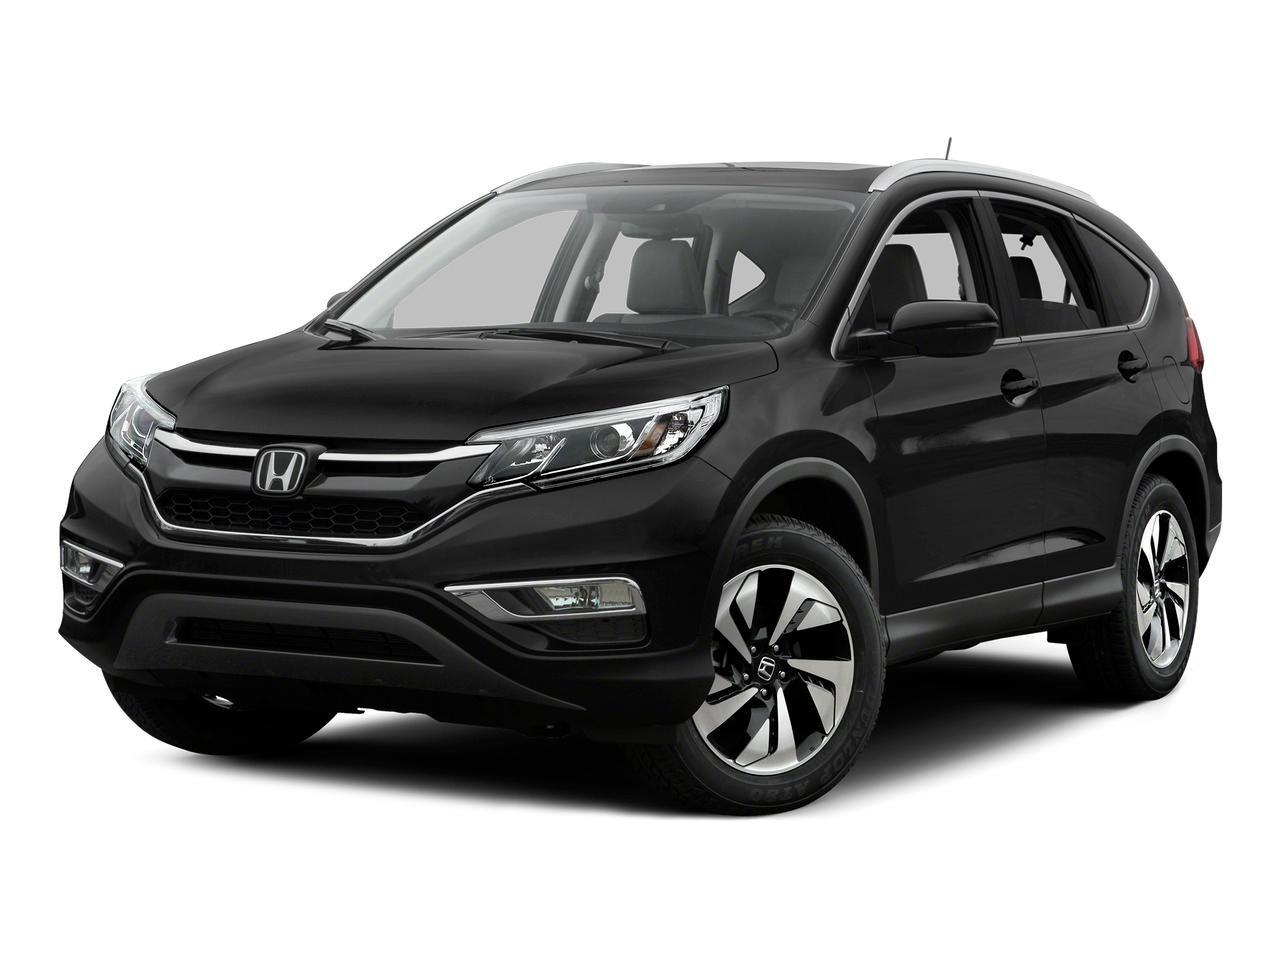 2015 Honda CR-V Vehicle Photo in San Antonio, TX 78257